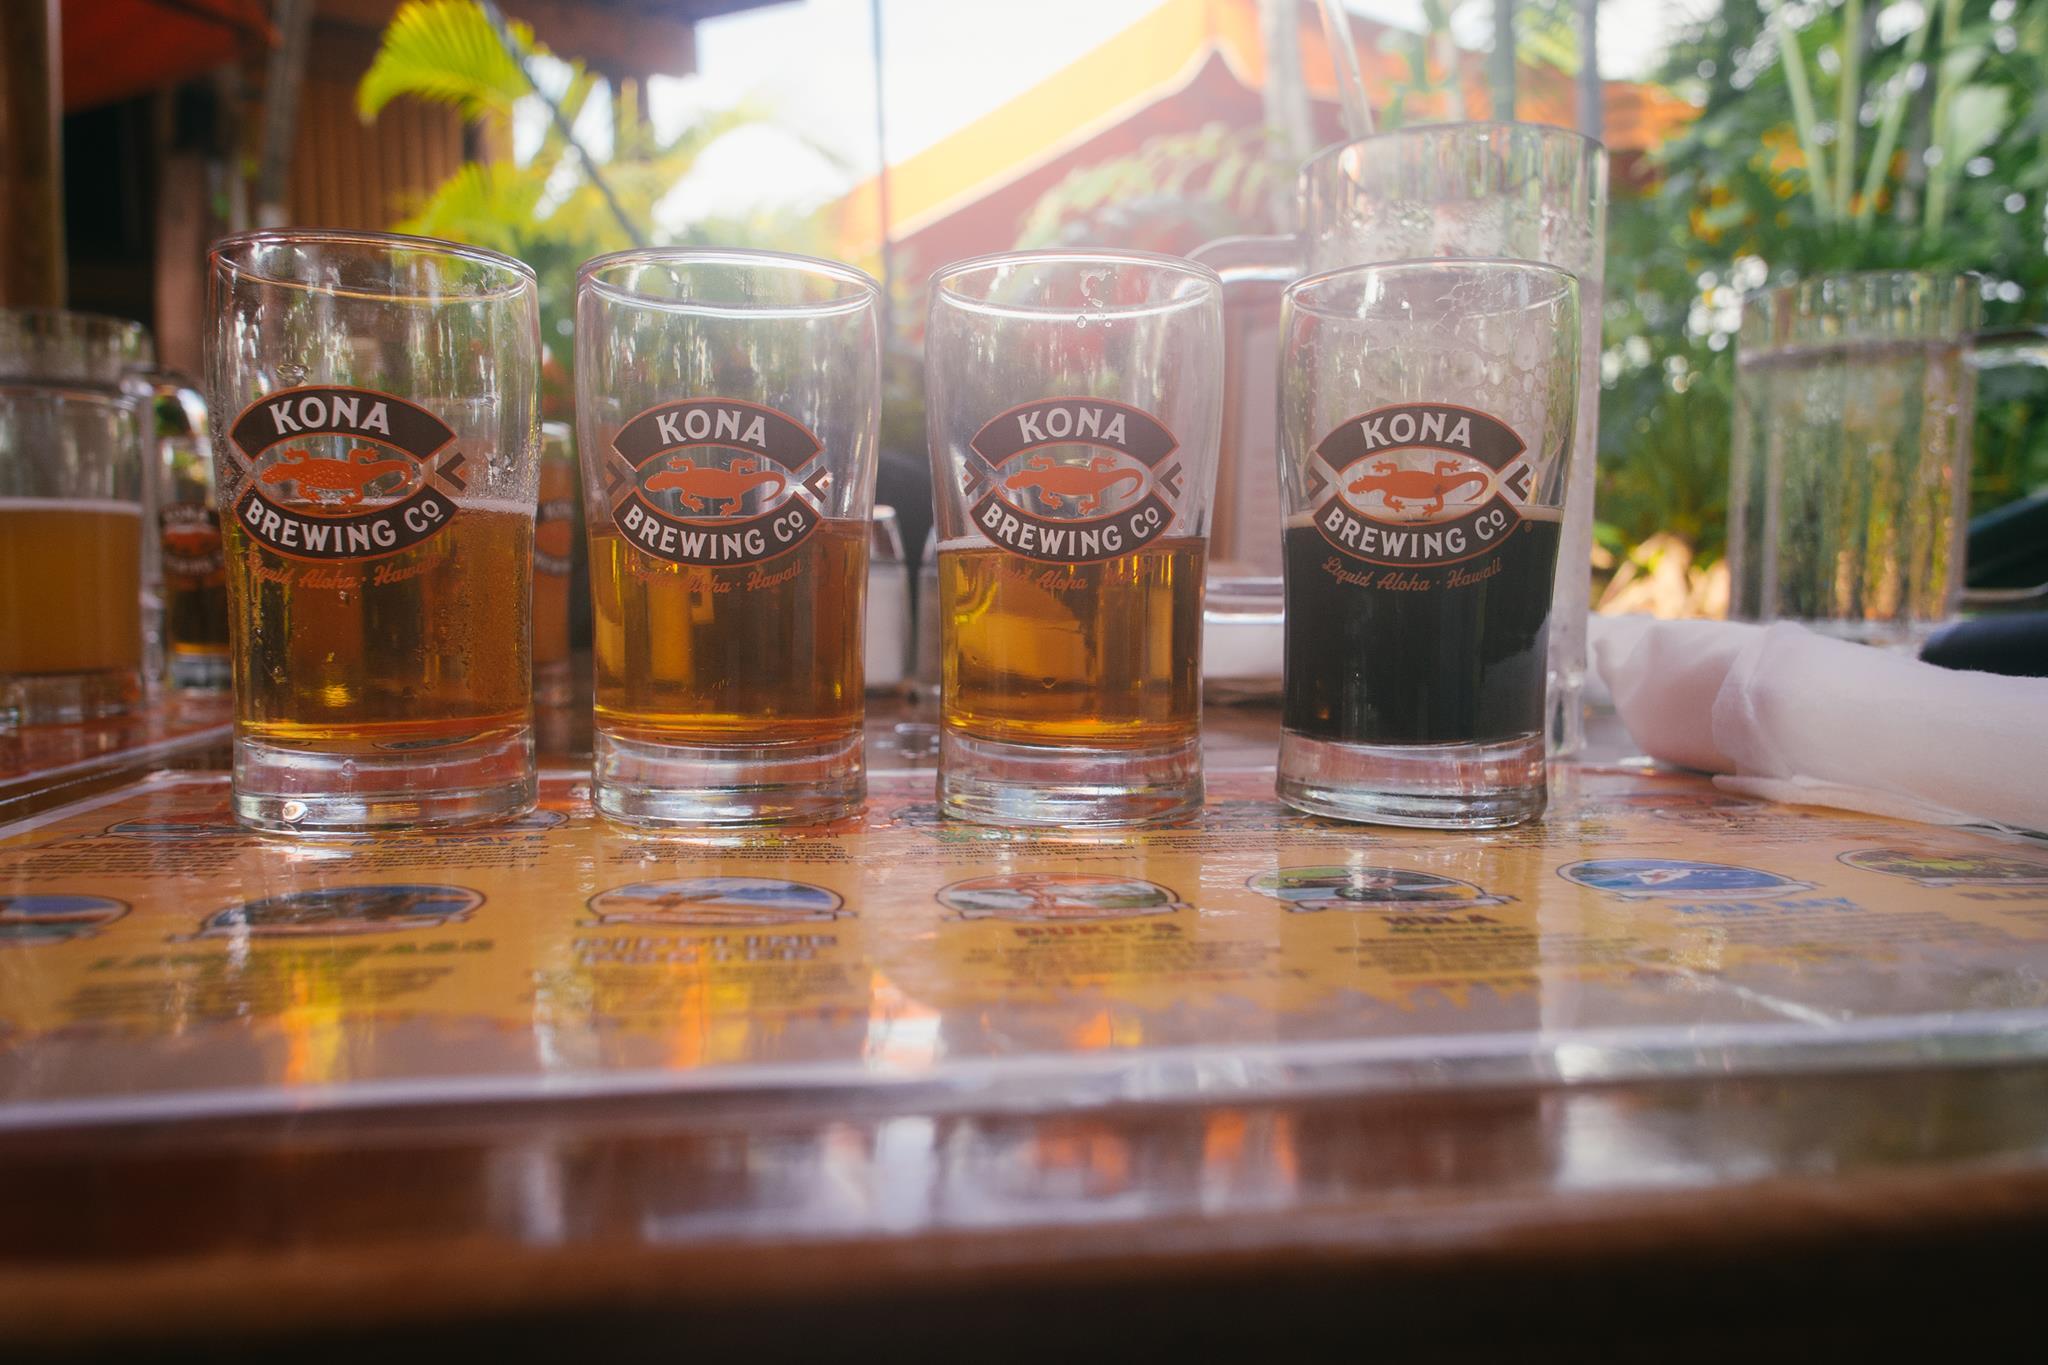 Kona Brewing Co. Craft Beer Hawaii Brewery Pub Beertasting